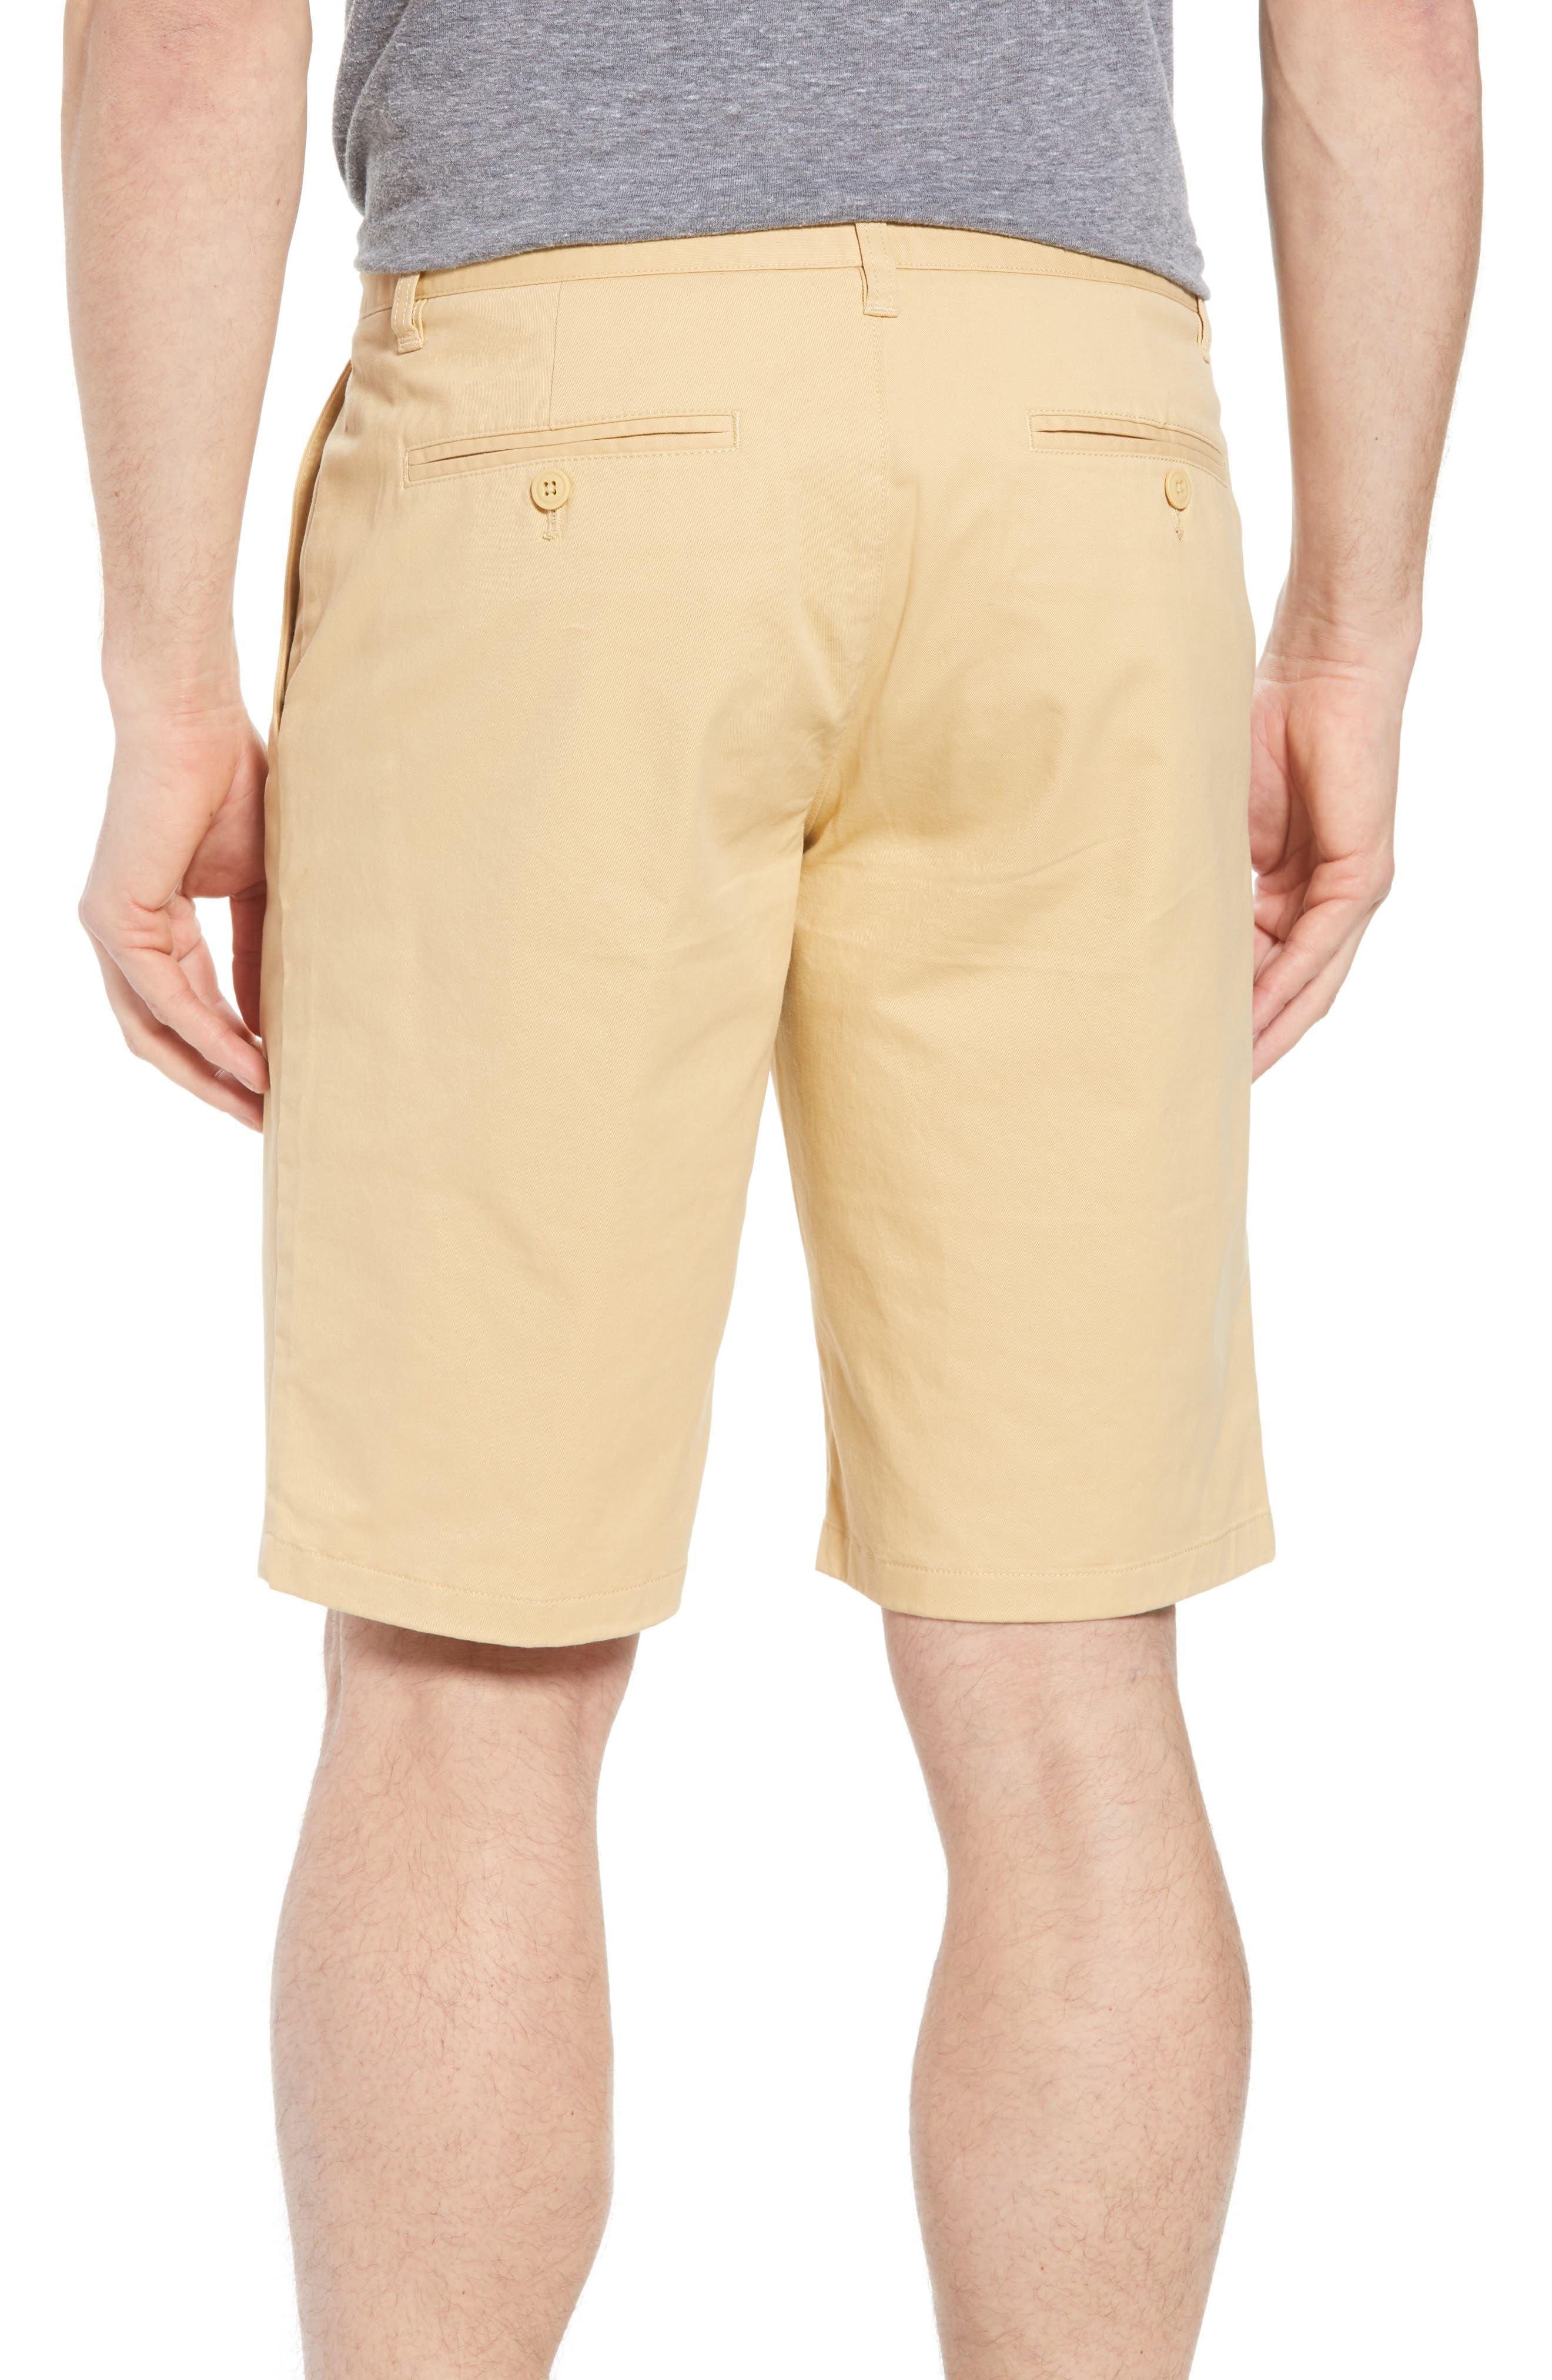 Stretch Washed Chino 11-Inch Shorts,                             Alternate thumbnail 2, color,                             Gold Khaki